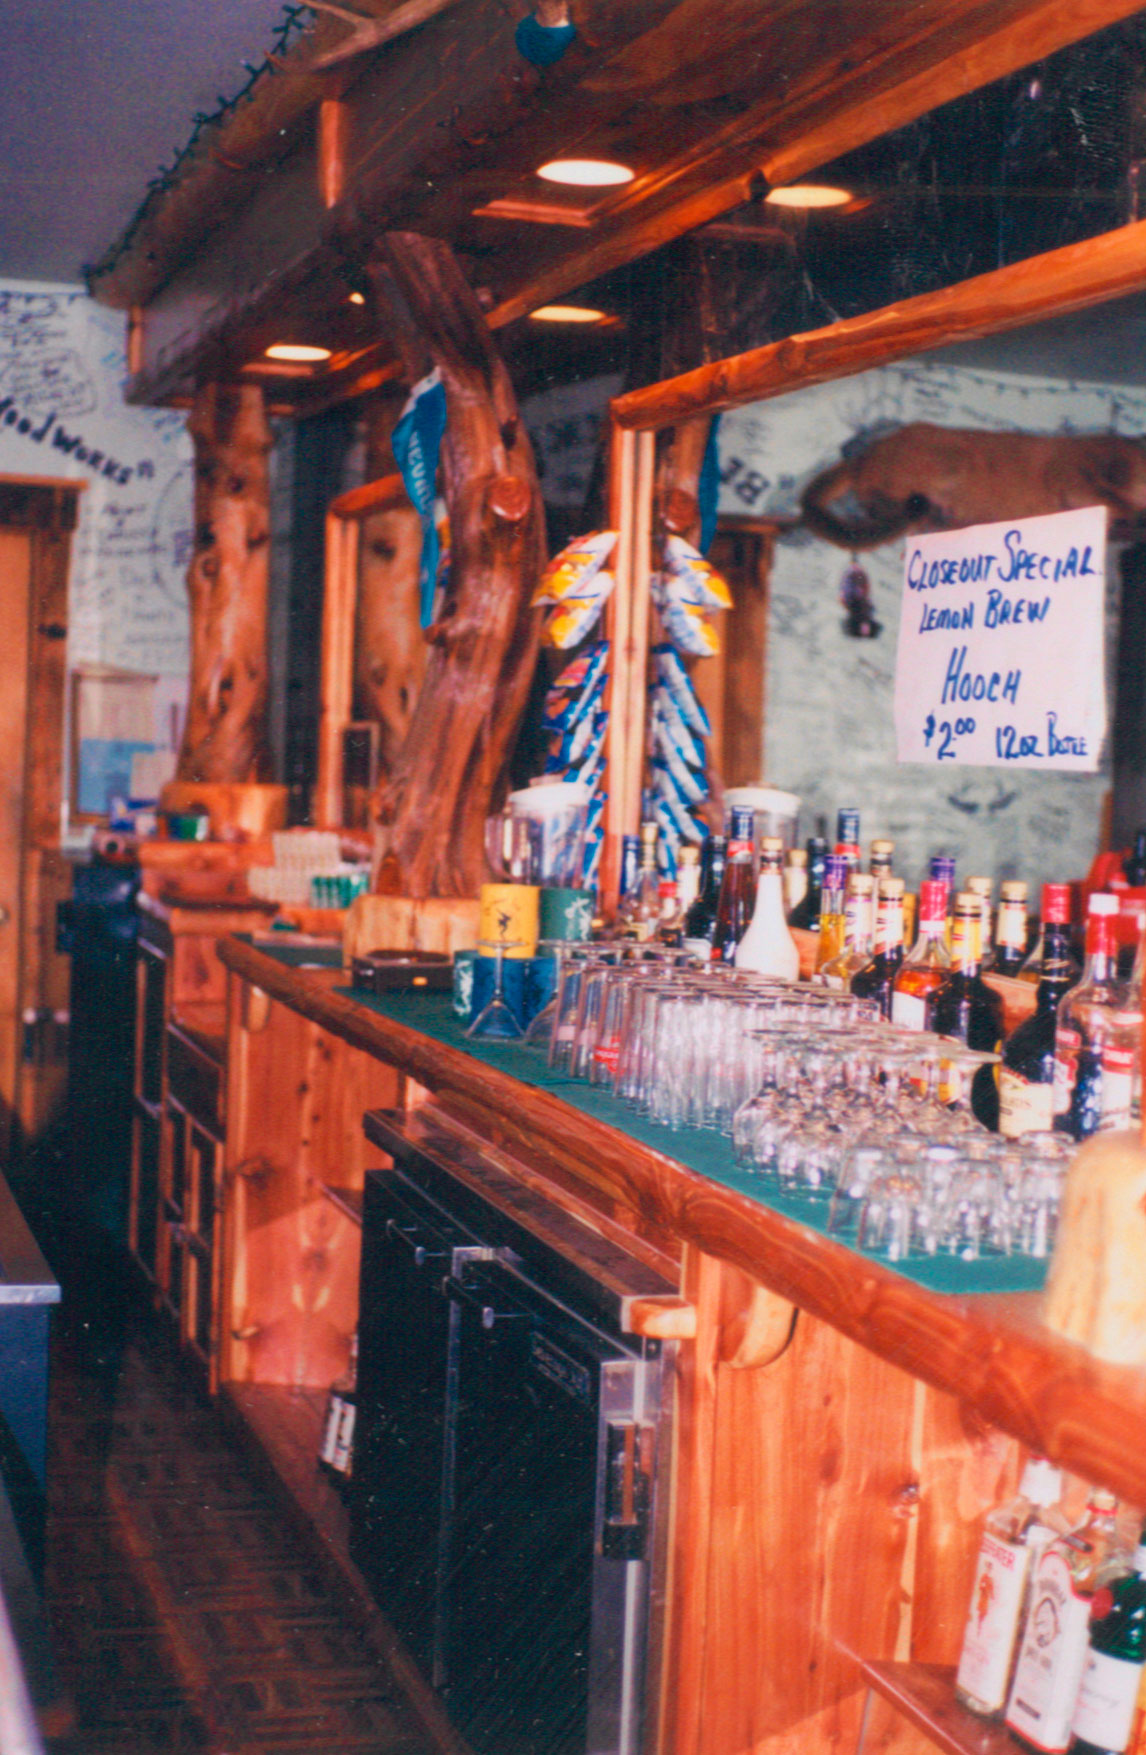 Outdoor Inn Complete Bar Build